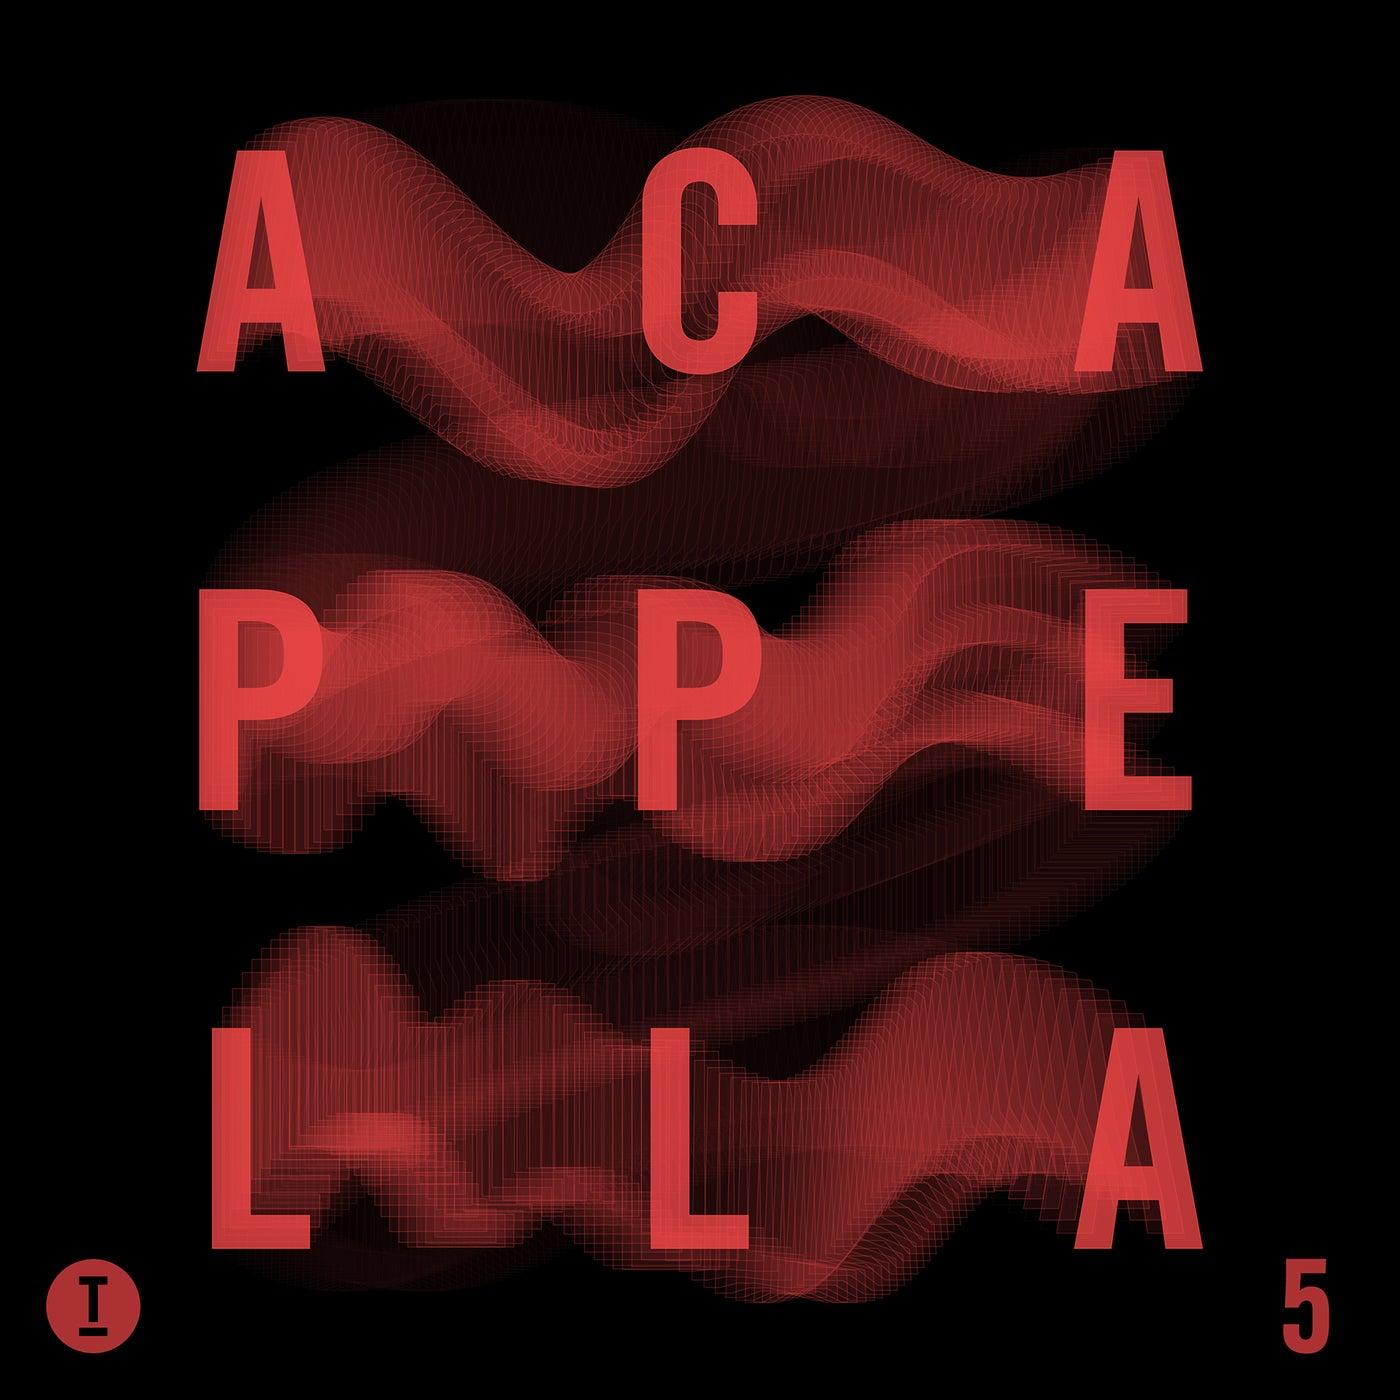 Back to Basics feat. Mr. V (Acapella)